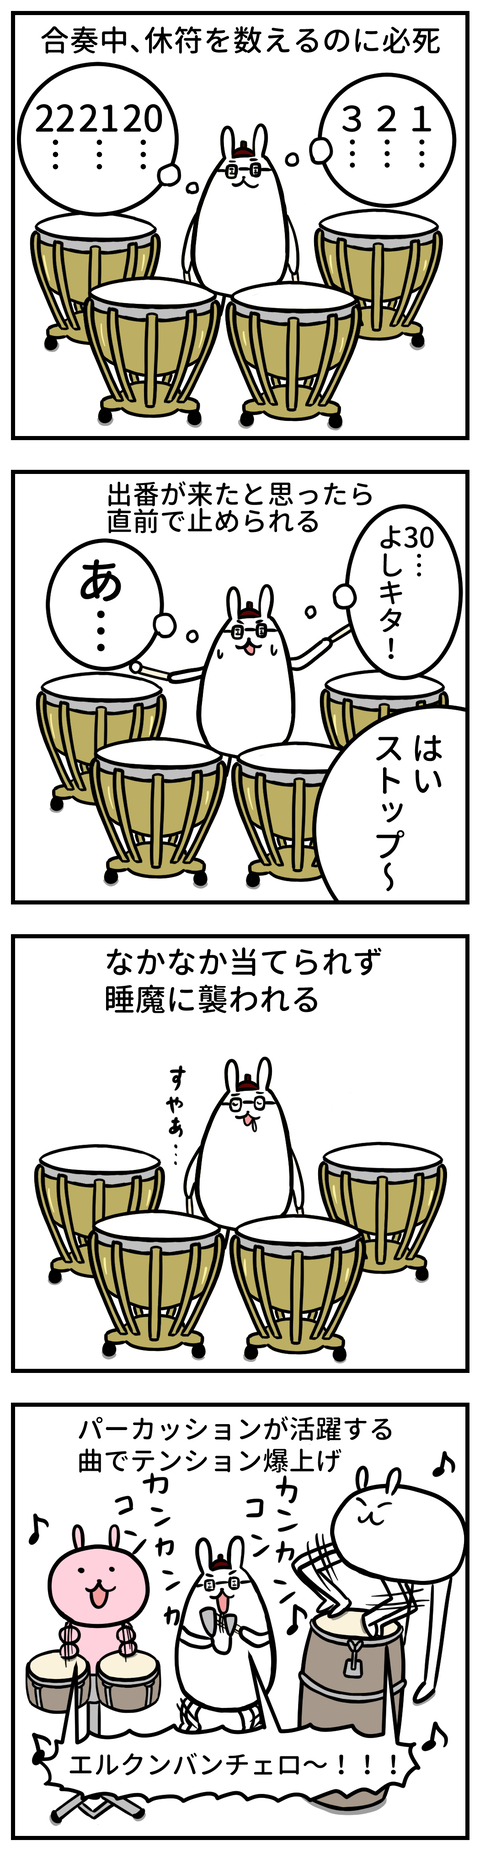 manga-yuzuporo65-1